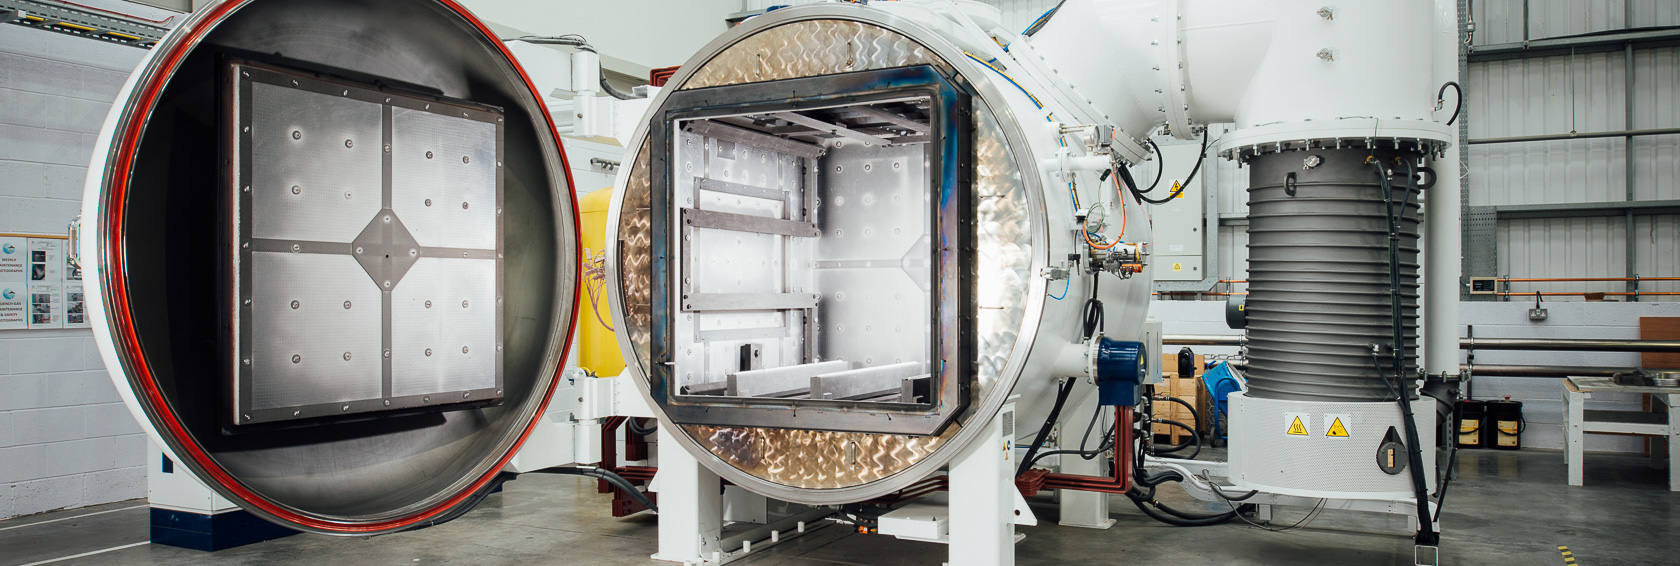 Furnaces Vfe Heat Treatment Industry Equipment Servicing